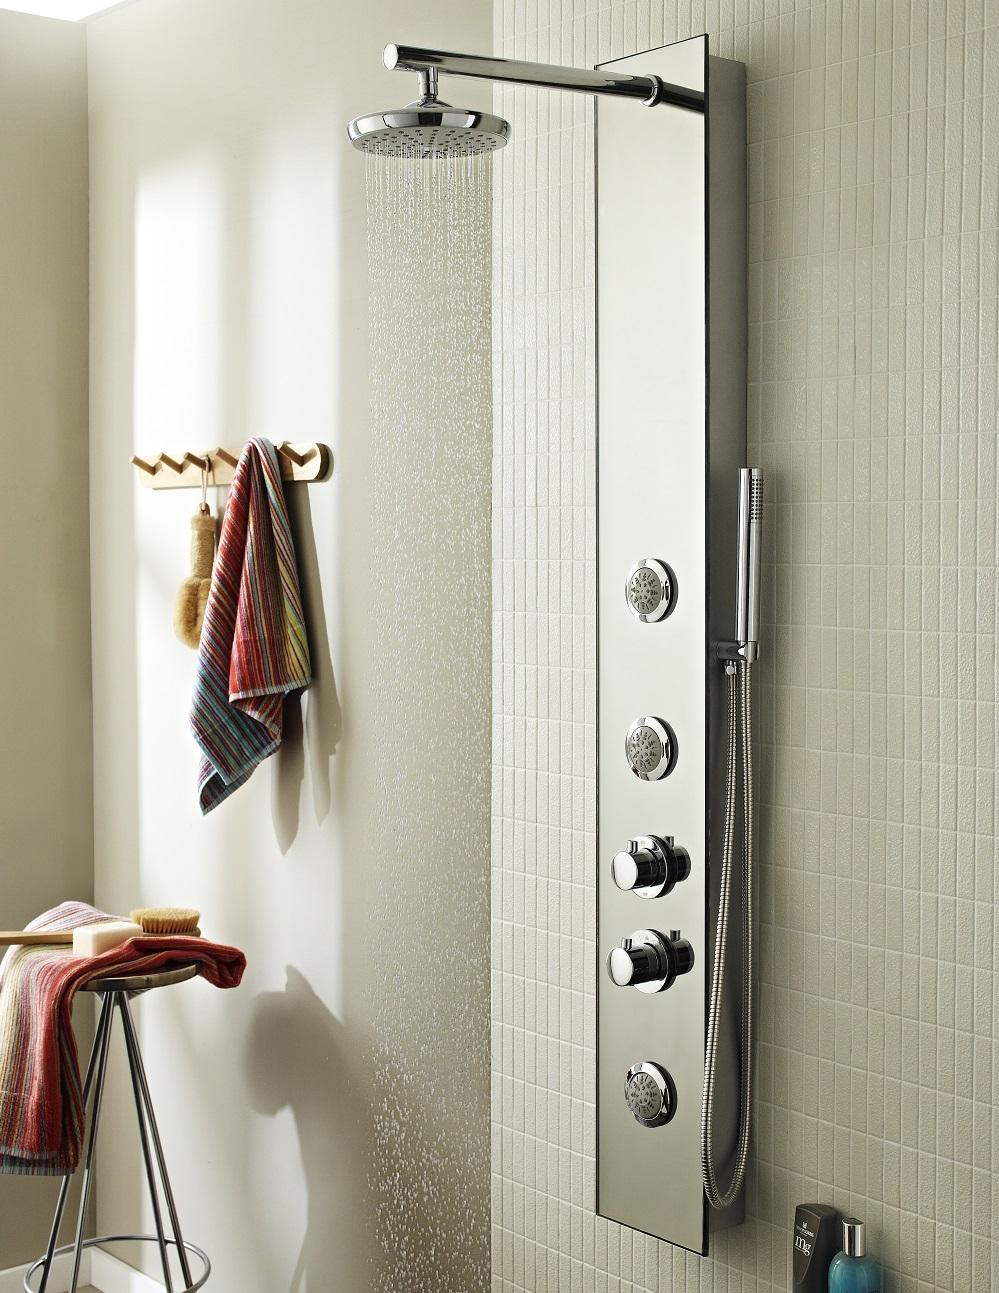 Jacuzzi Shower Panel - Cintinel.com